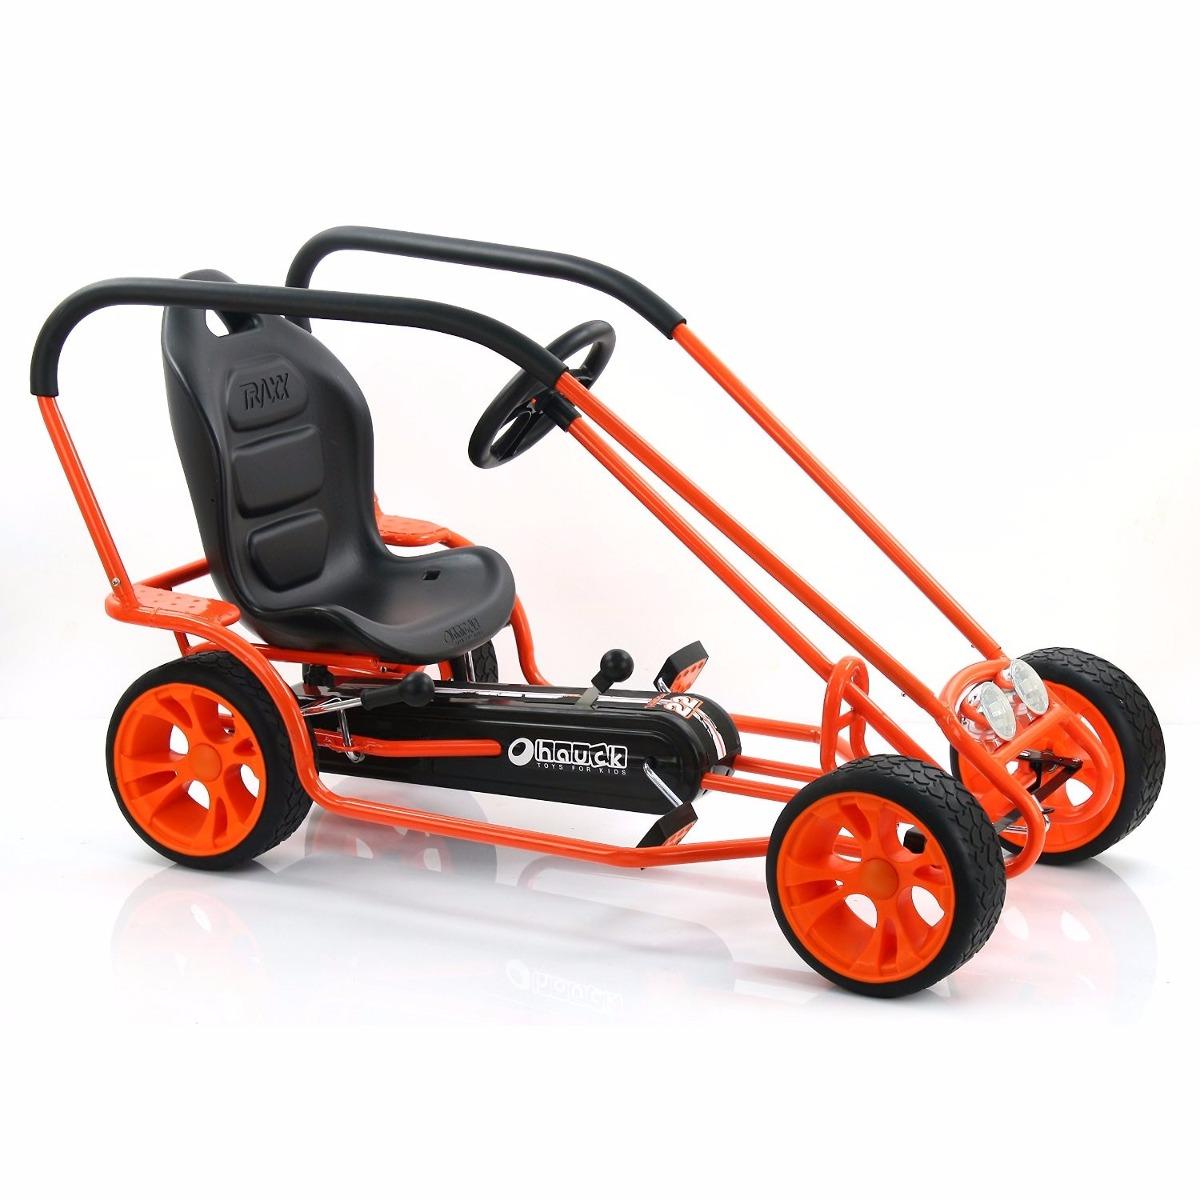 gokart carro montable de pedales thunder ii hauck 5 12 a os 5 en mercado libre. Black Bedroom Furniture Sets. Home Design Ideas